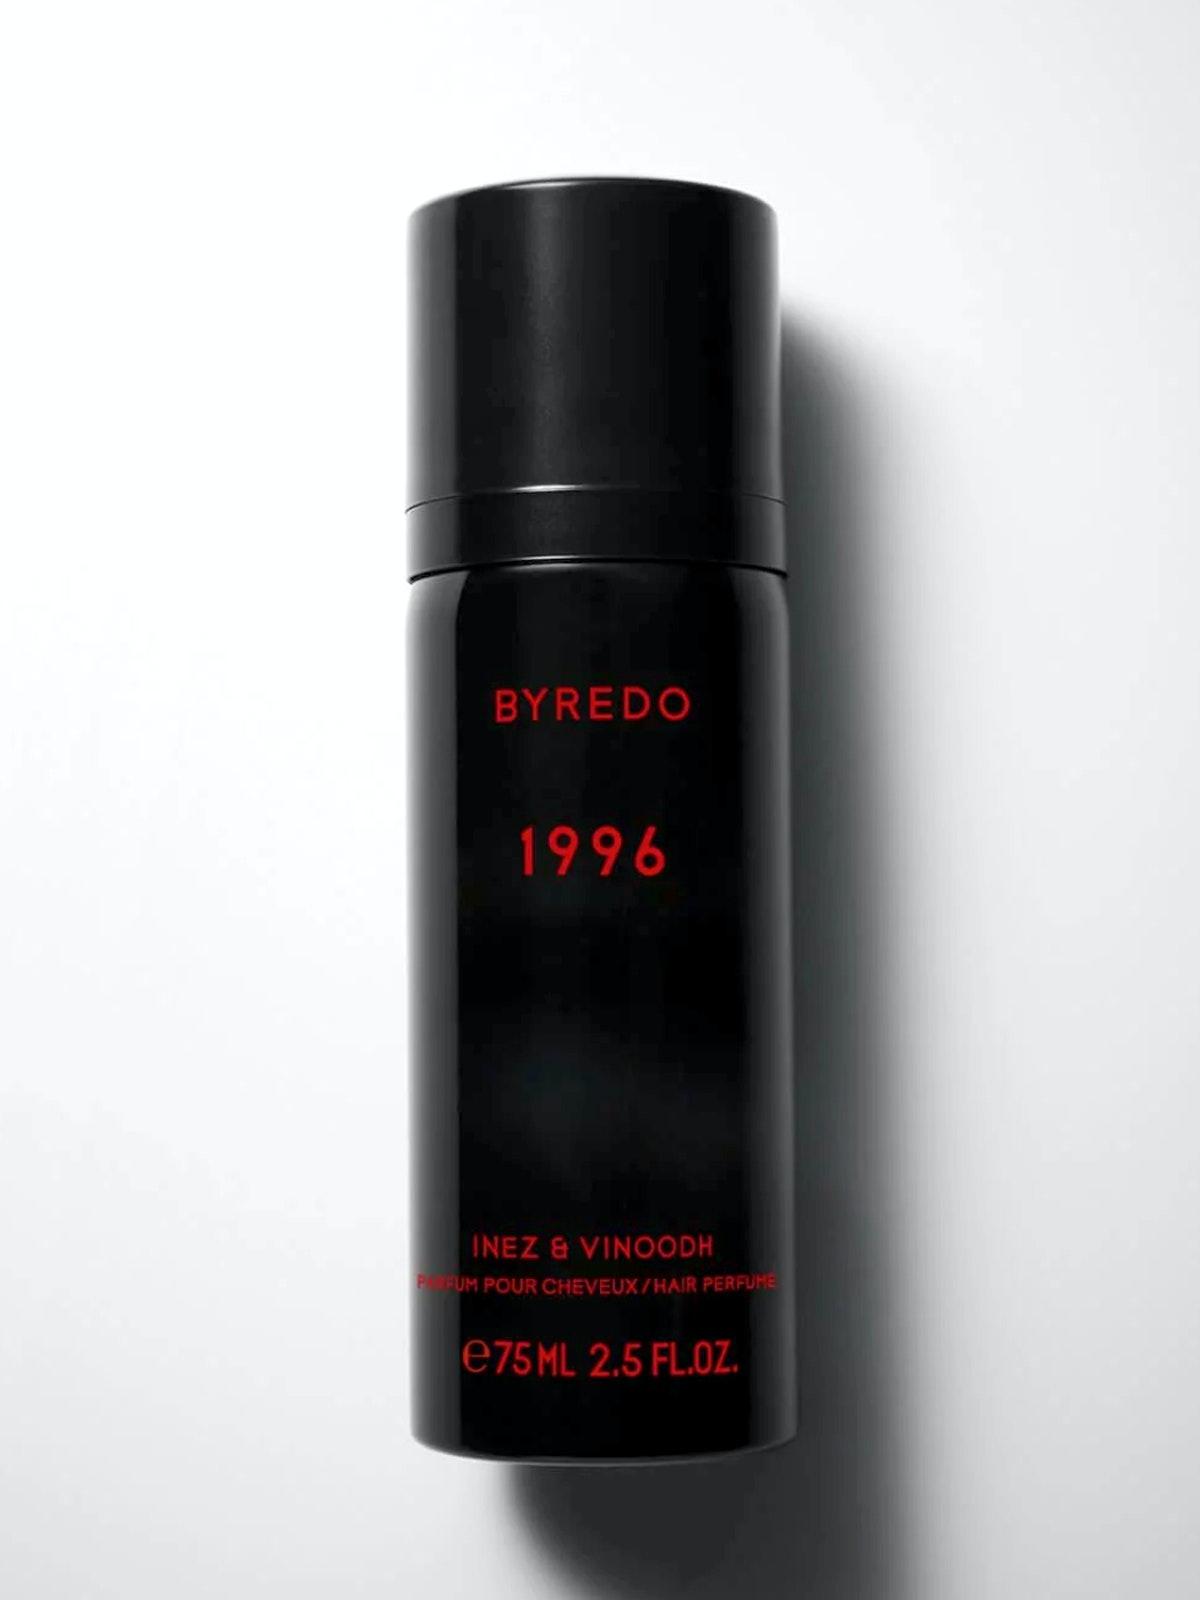 Byredo x Inez & Vinoodh Limited Edition 1996 Hair Perfume